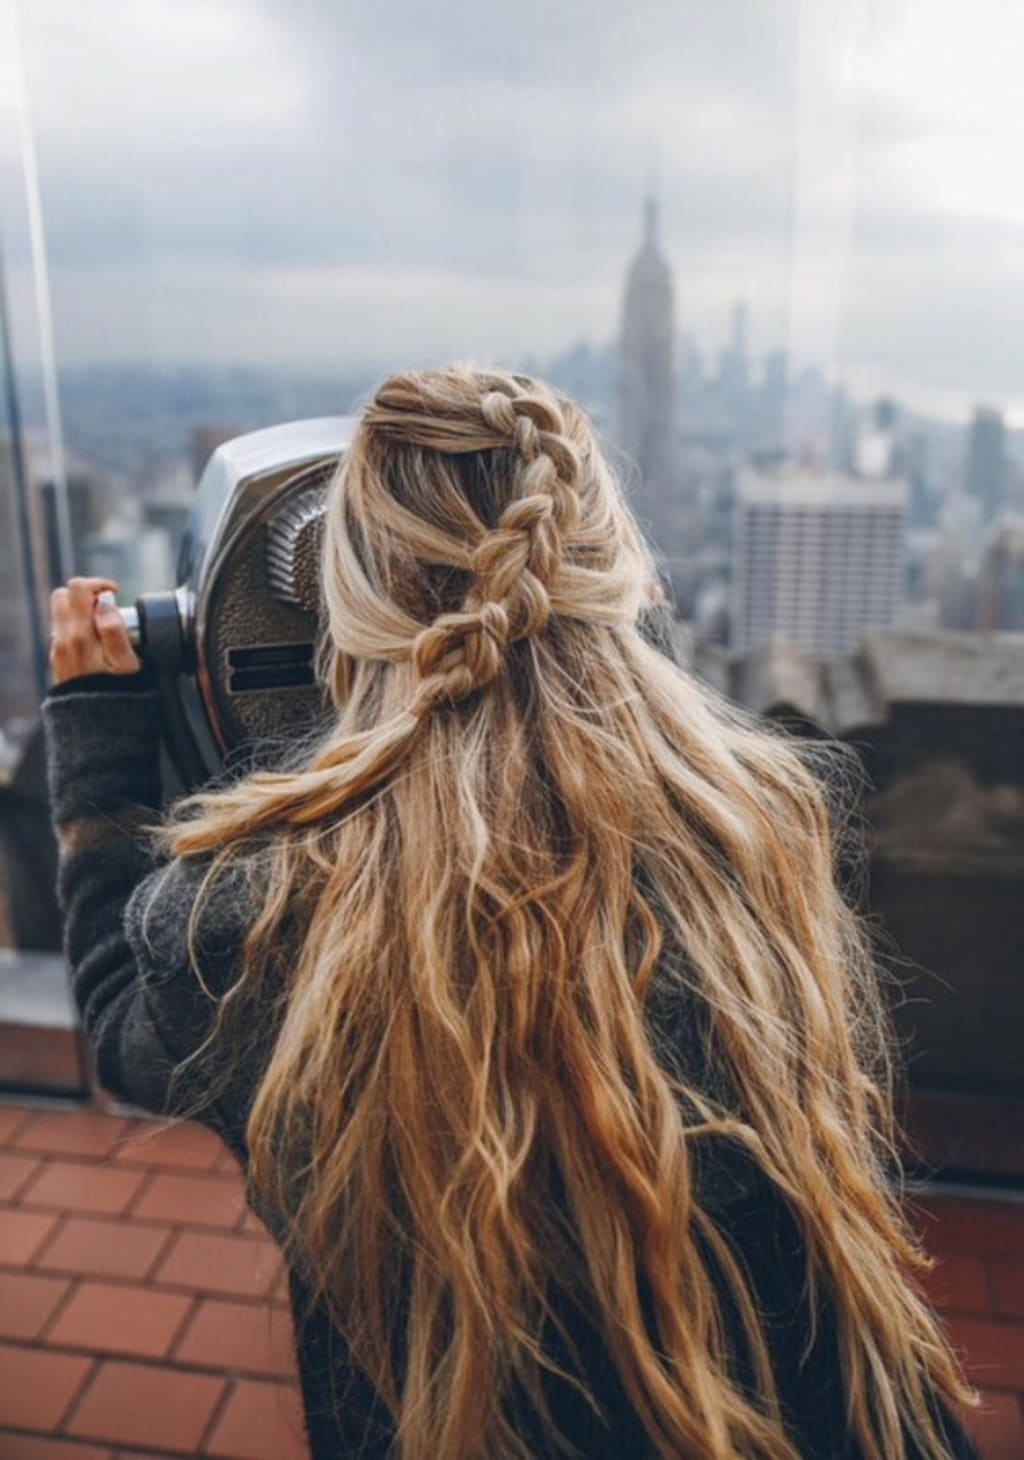 How to Grow Long, Healthy Hair